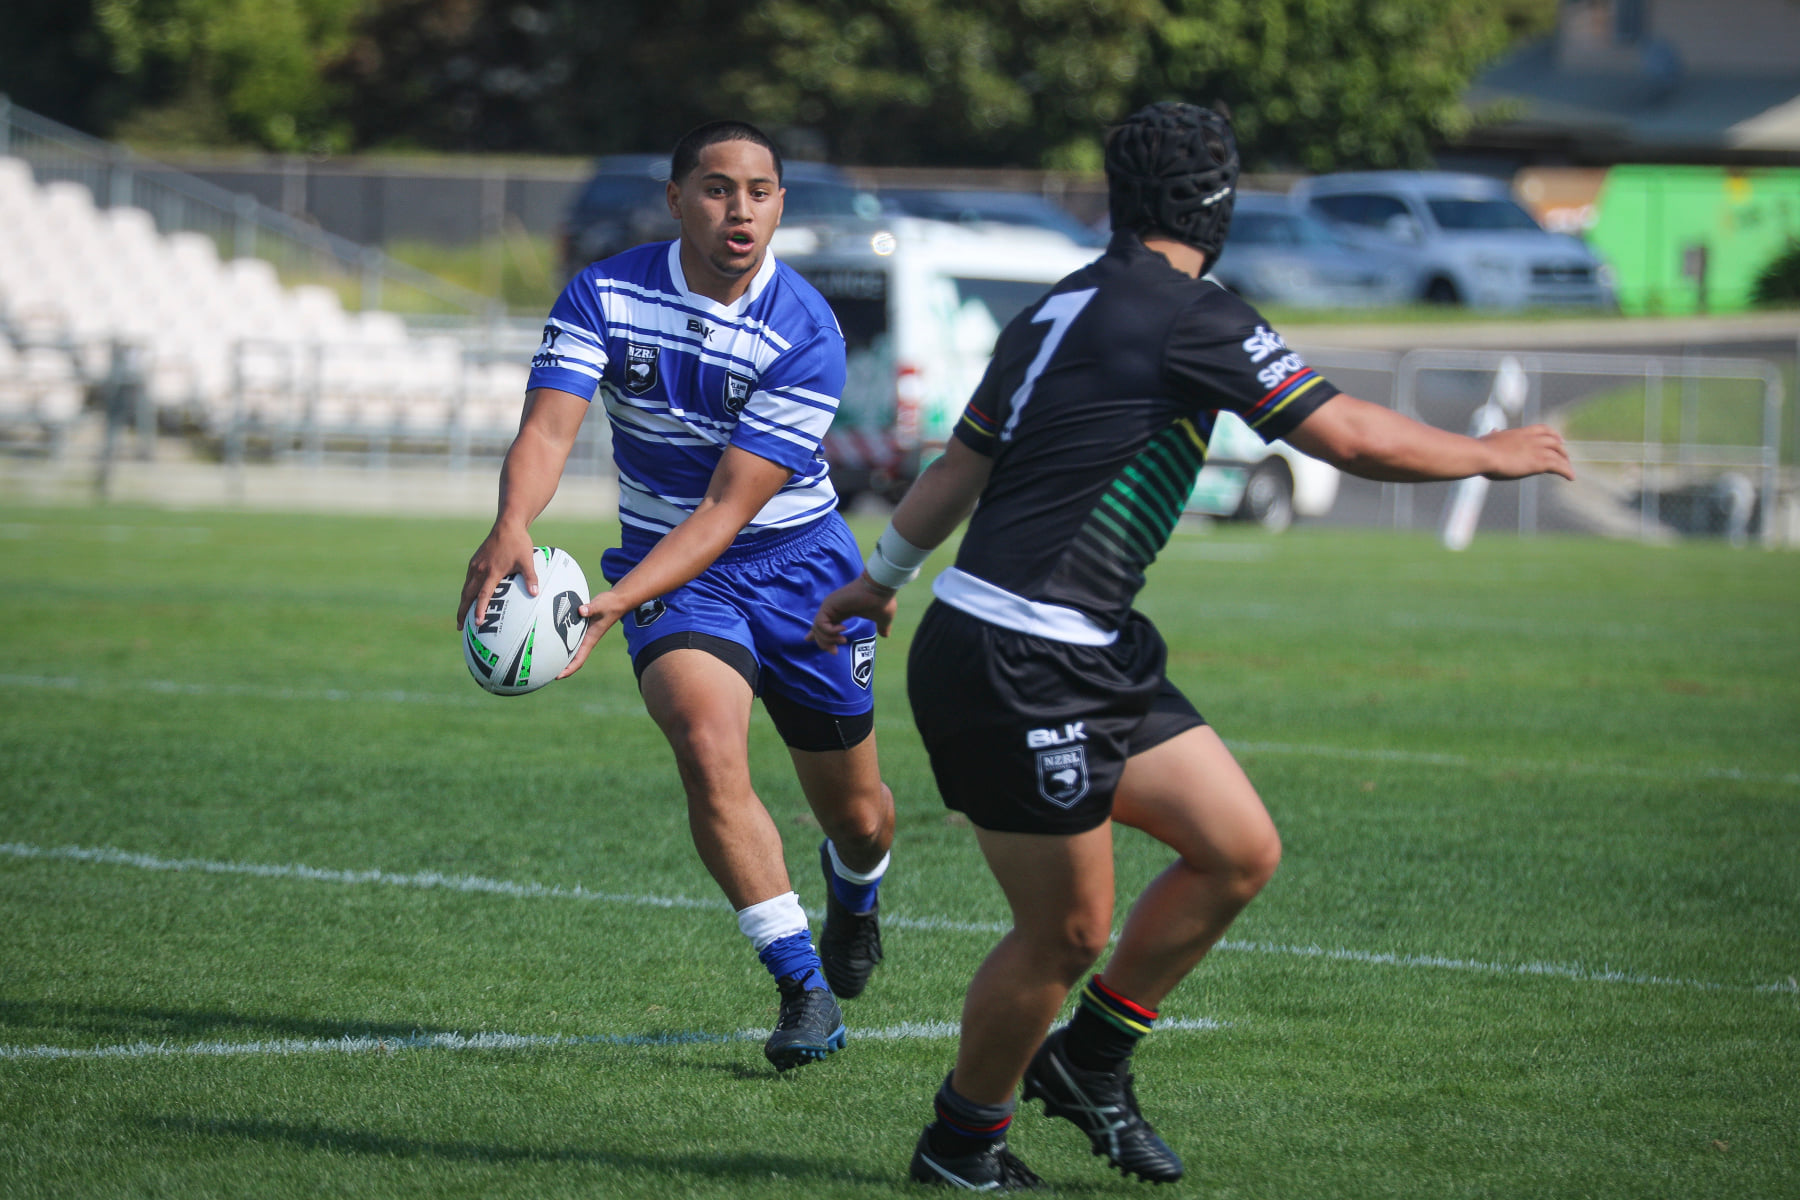 Auckland White win away win over Wai-Coa-Bay